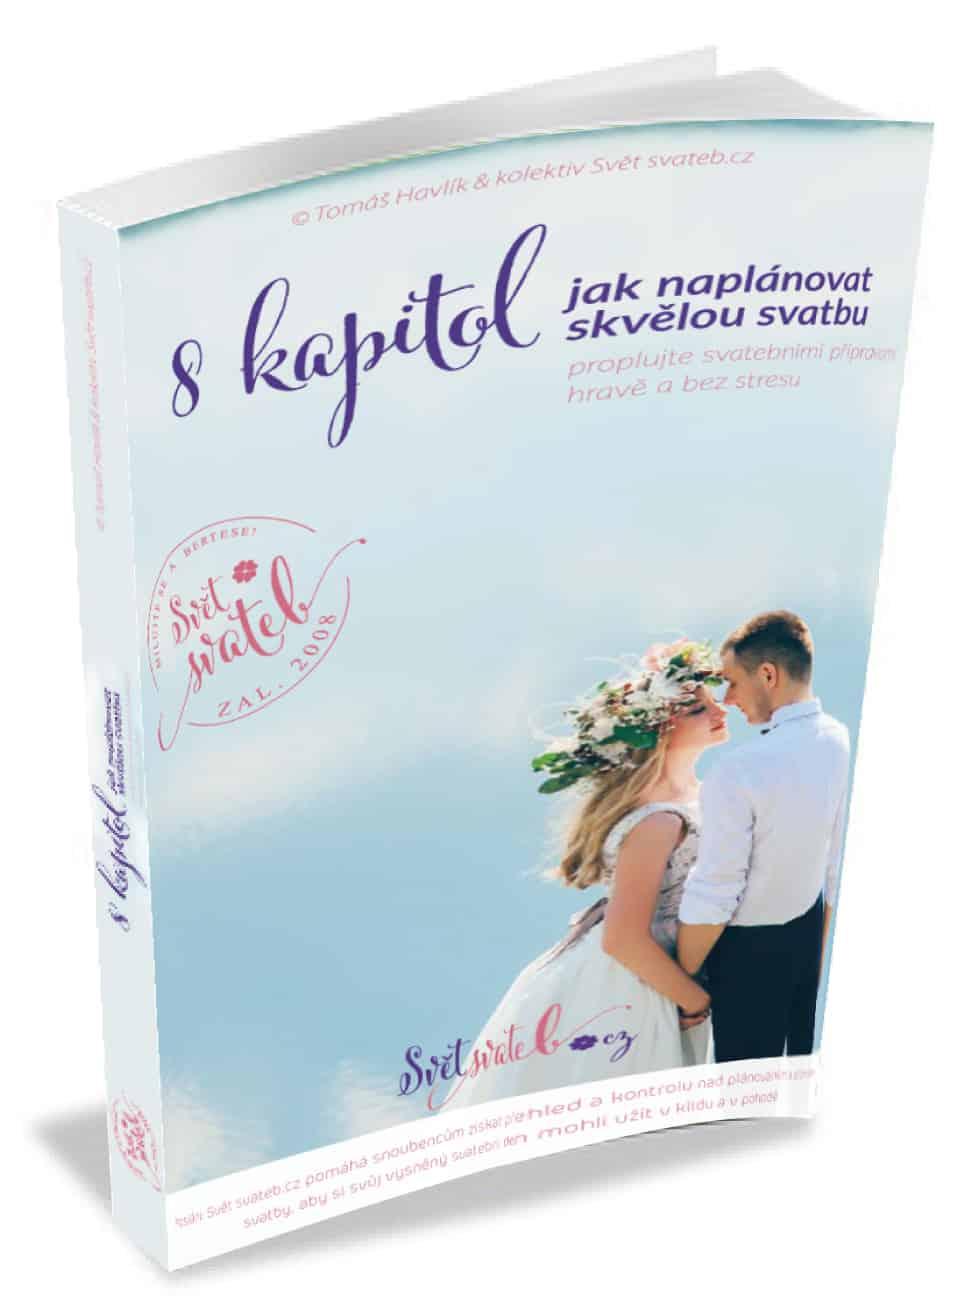 Svatební eBook 8 kapitol obálka 3D